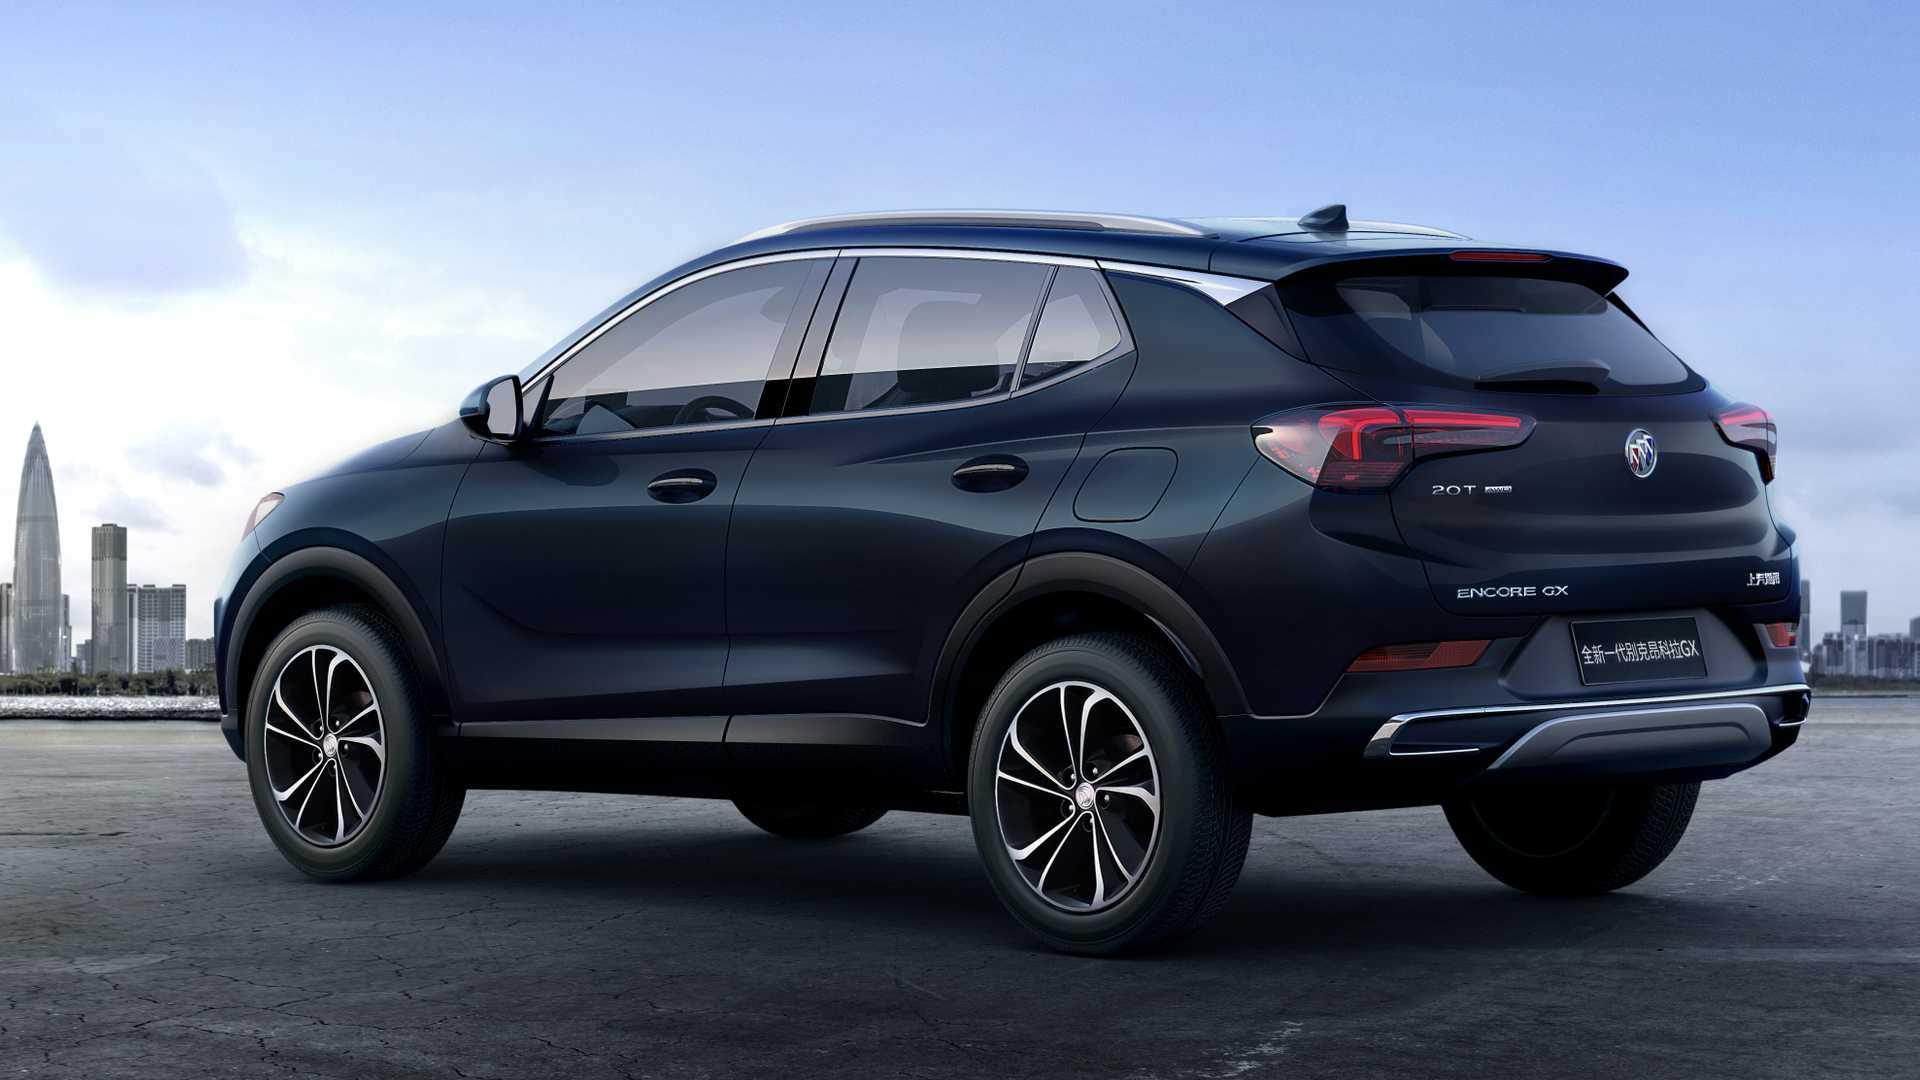 2020 Buick Encore Gx Fuel Economy Tops 31 Mpg Combined